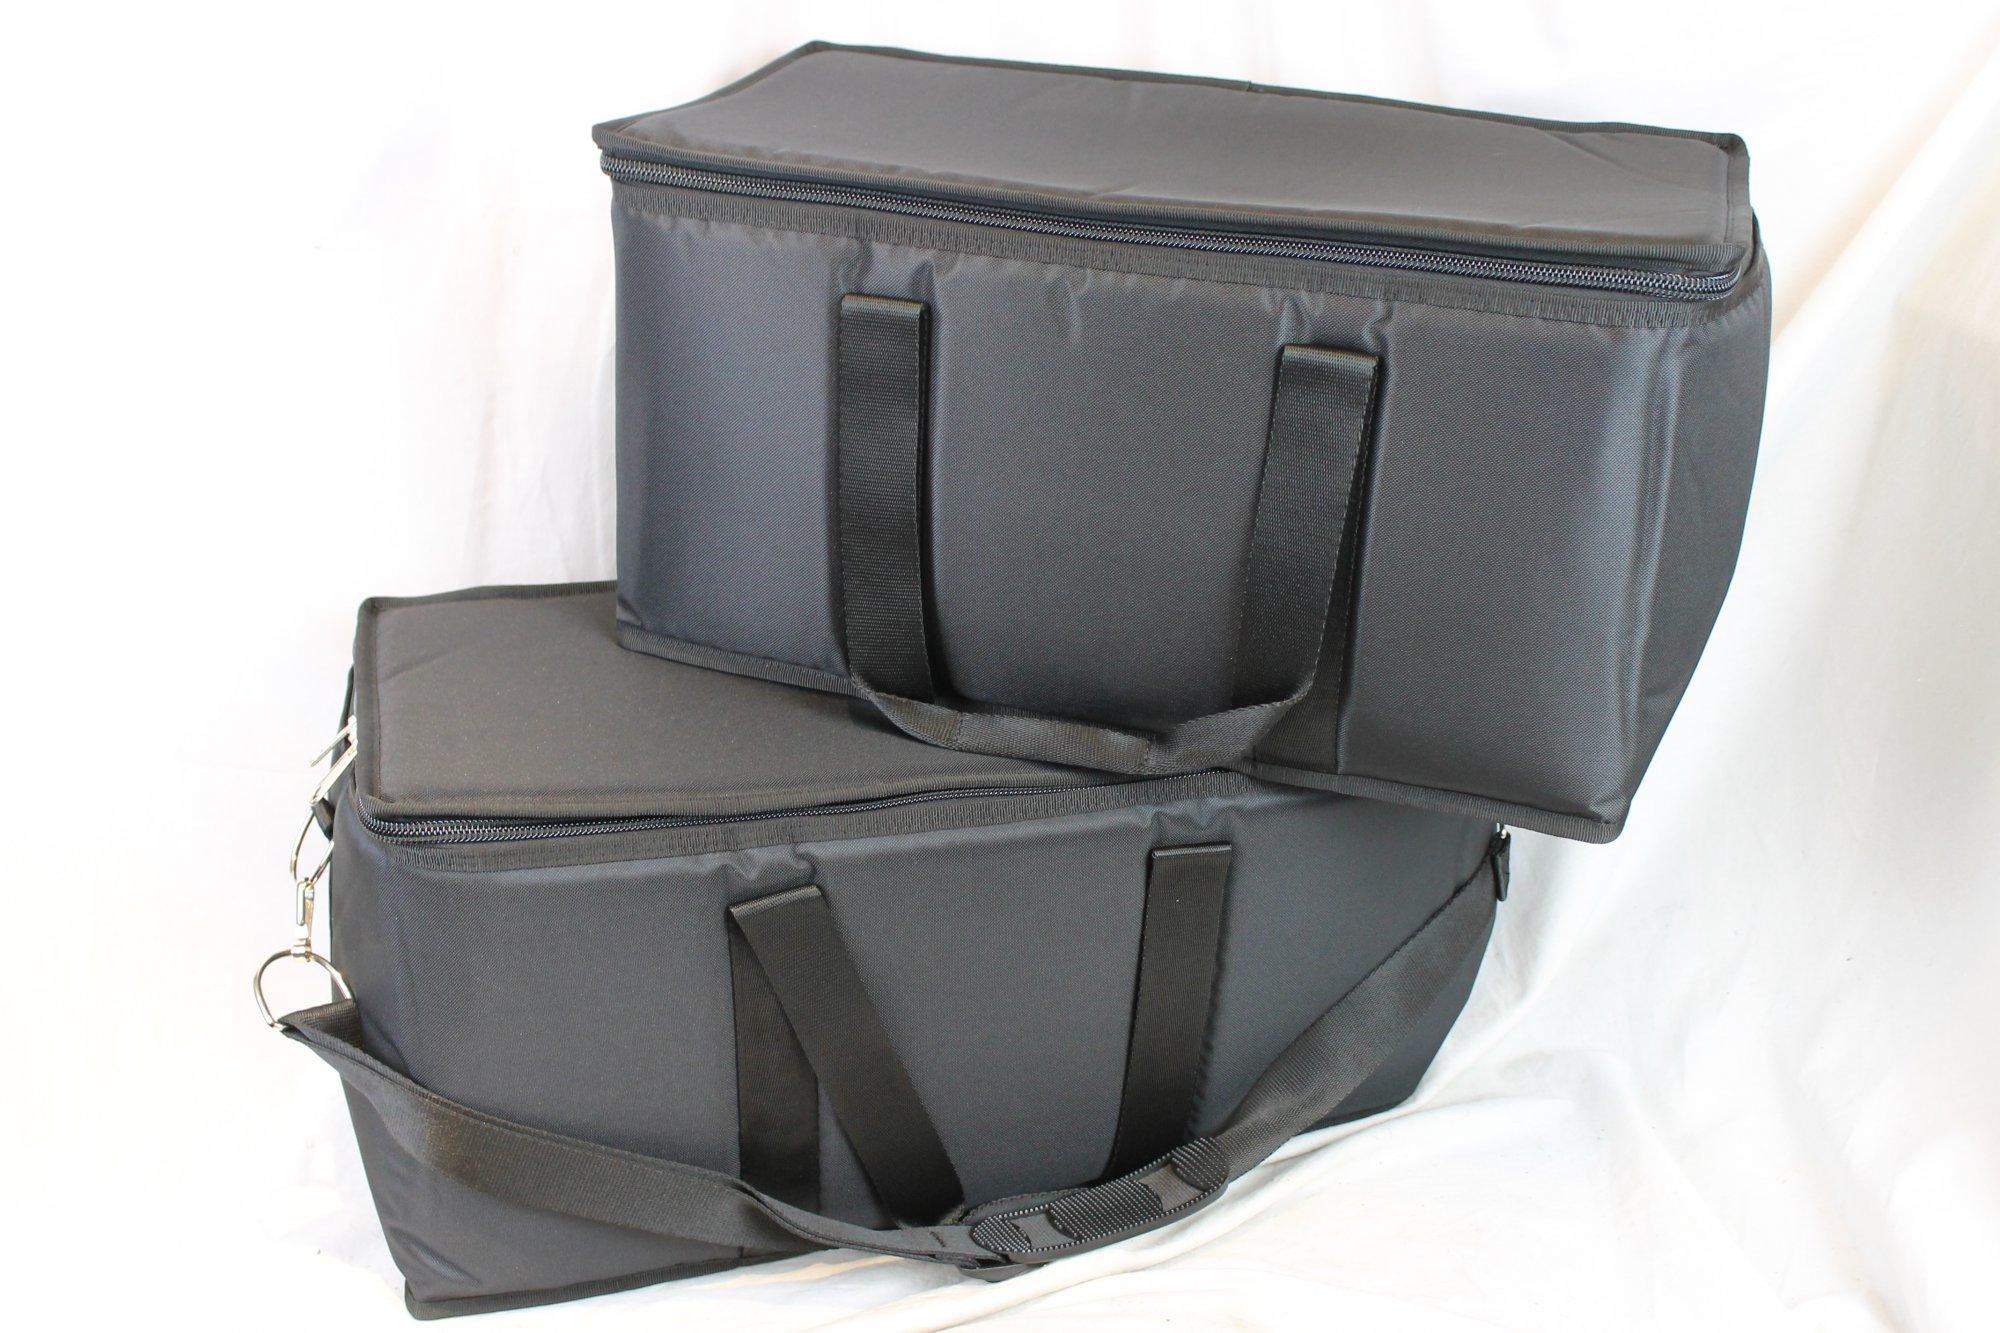 NEW Black Fuselli Dual Gig Bags for Accordion 22 x 11 x 10.5/21 x 10.5 x 10.5